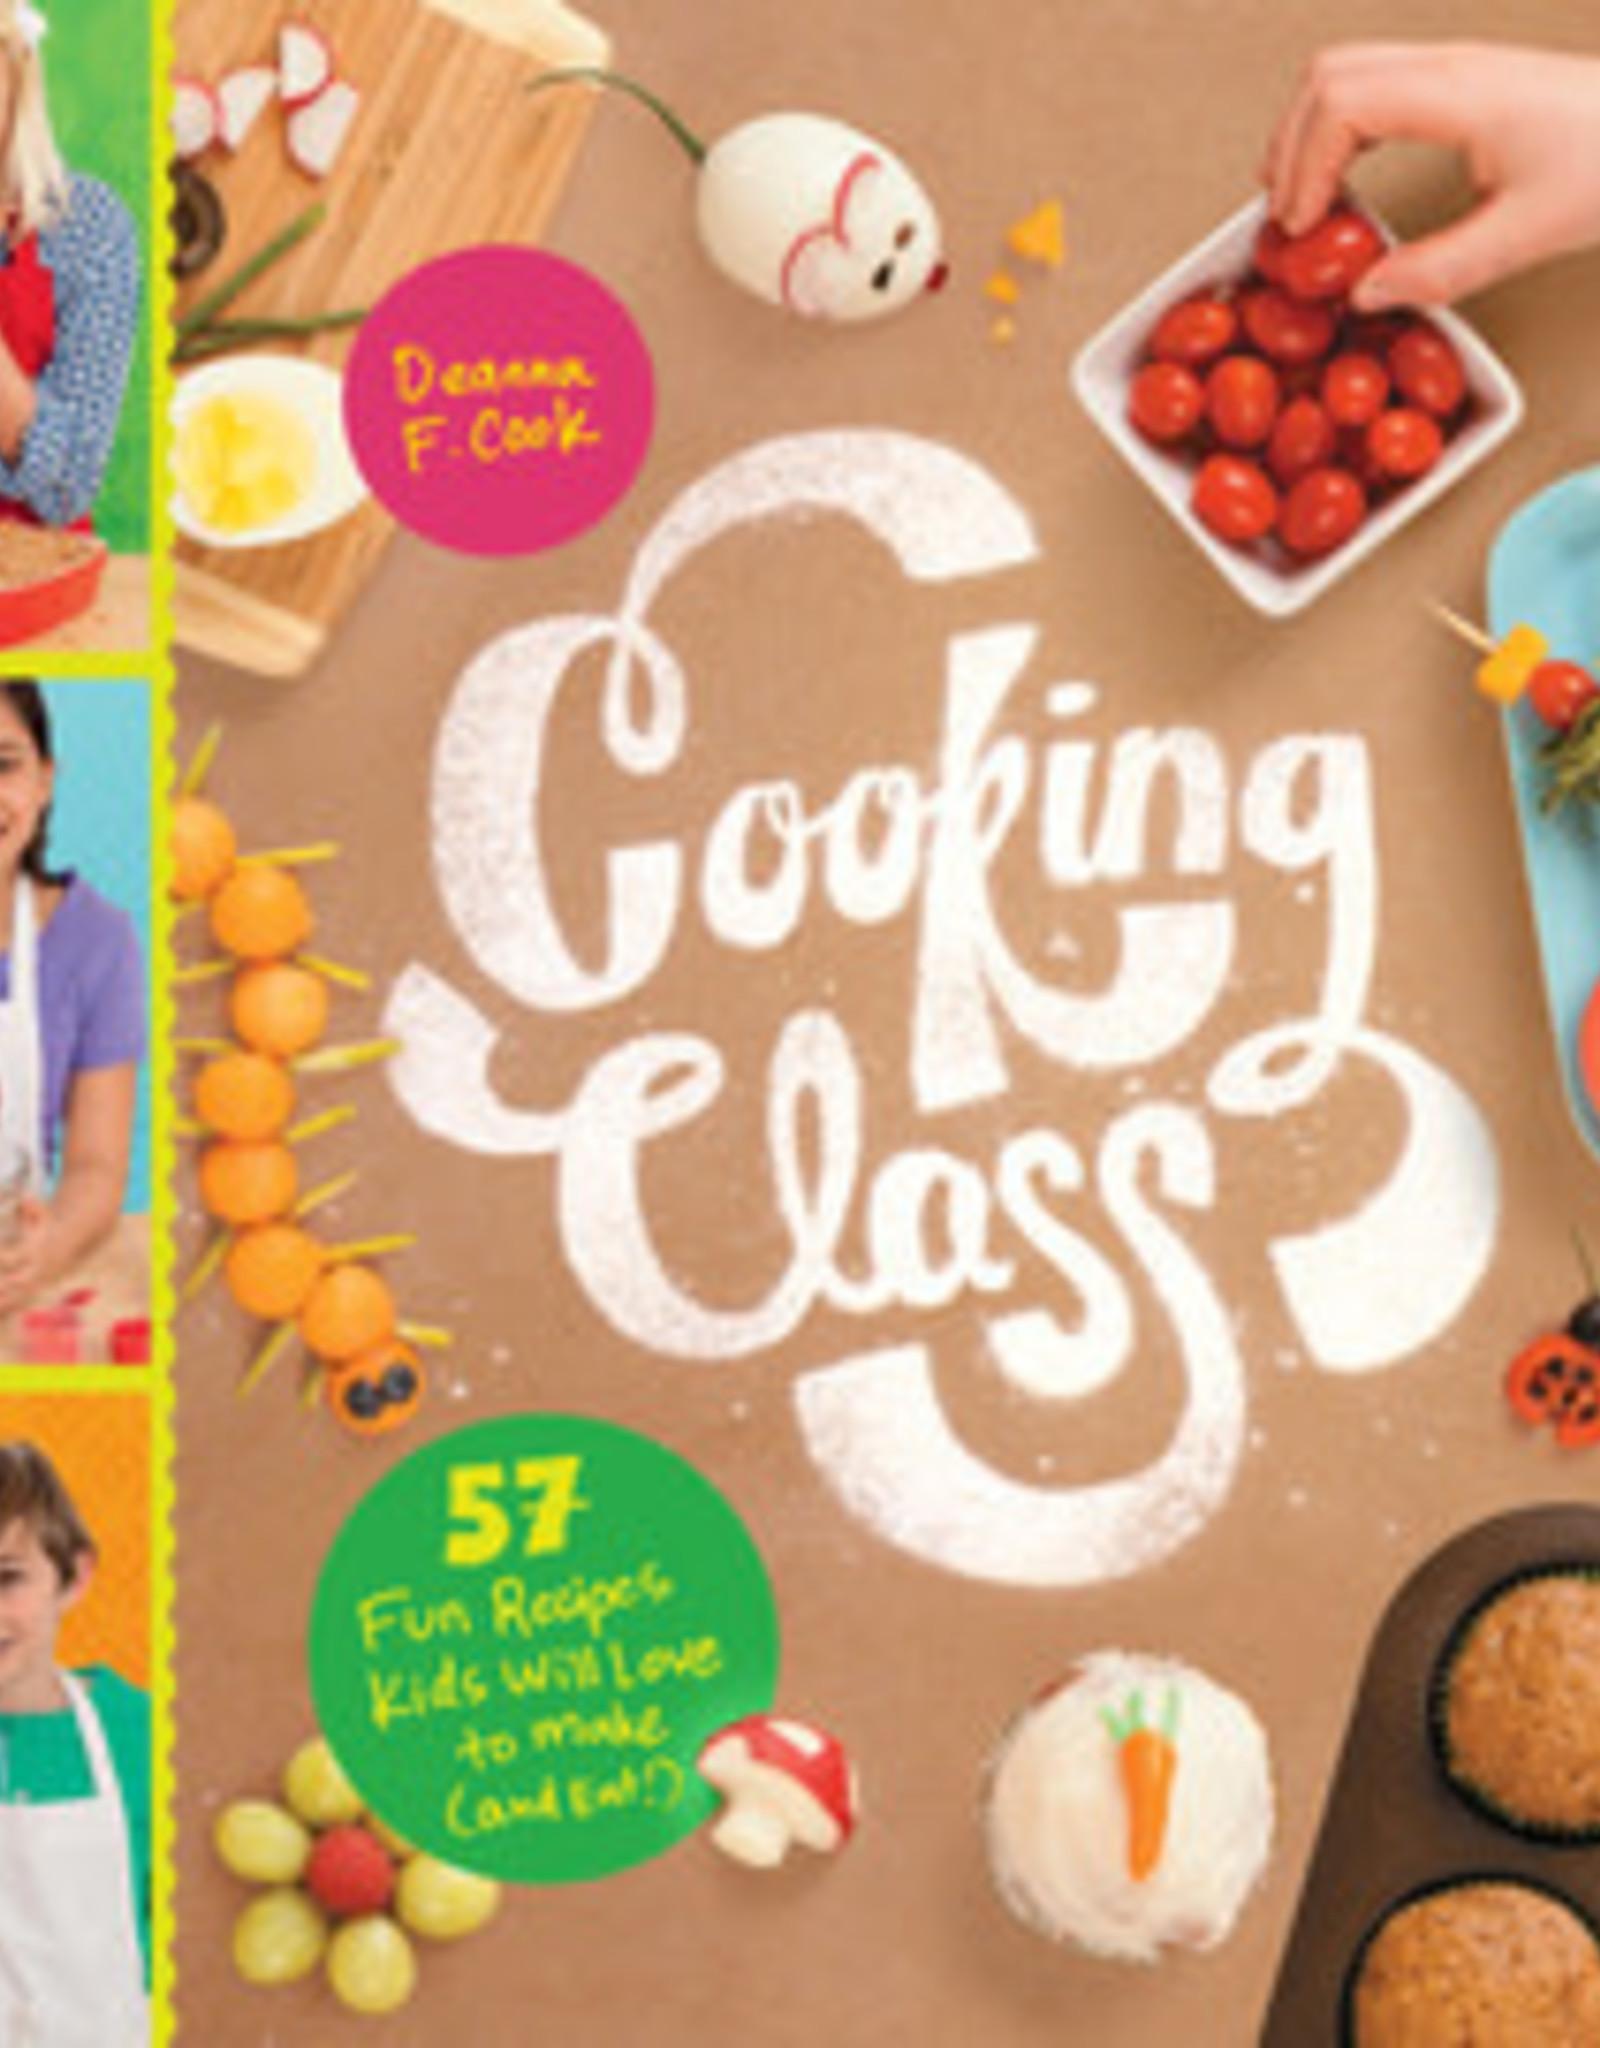 Workman Publishing Cooking Class